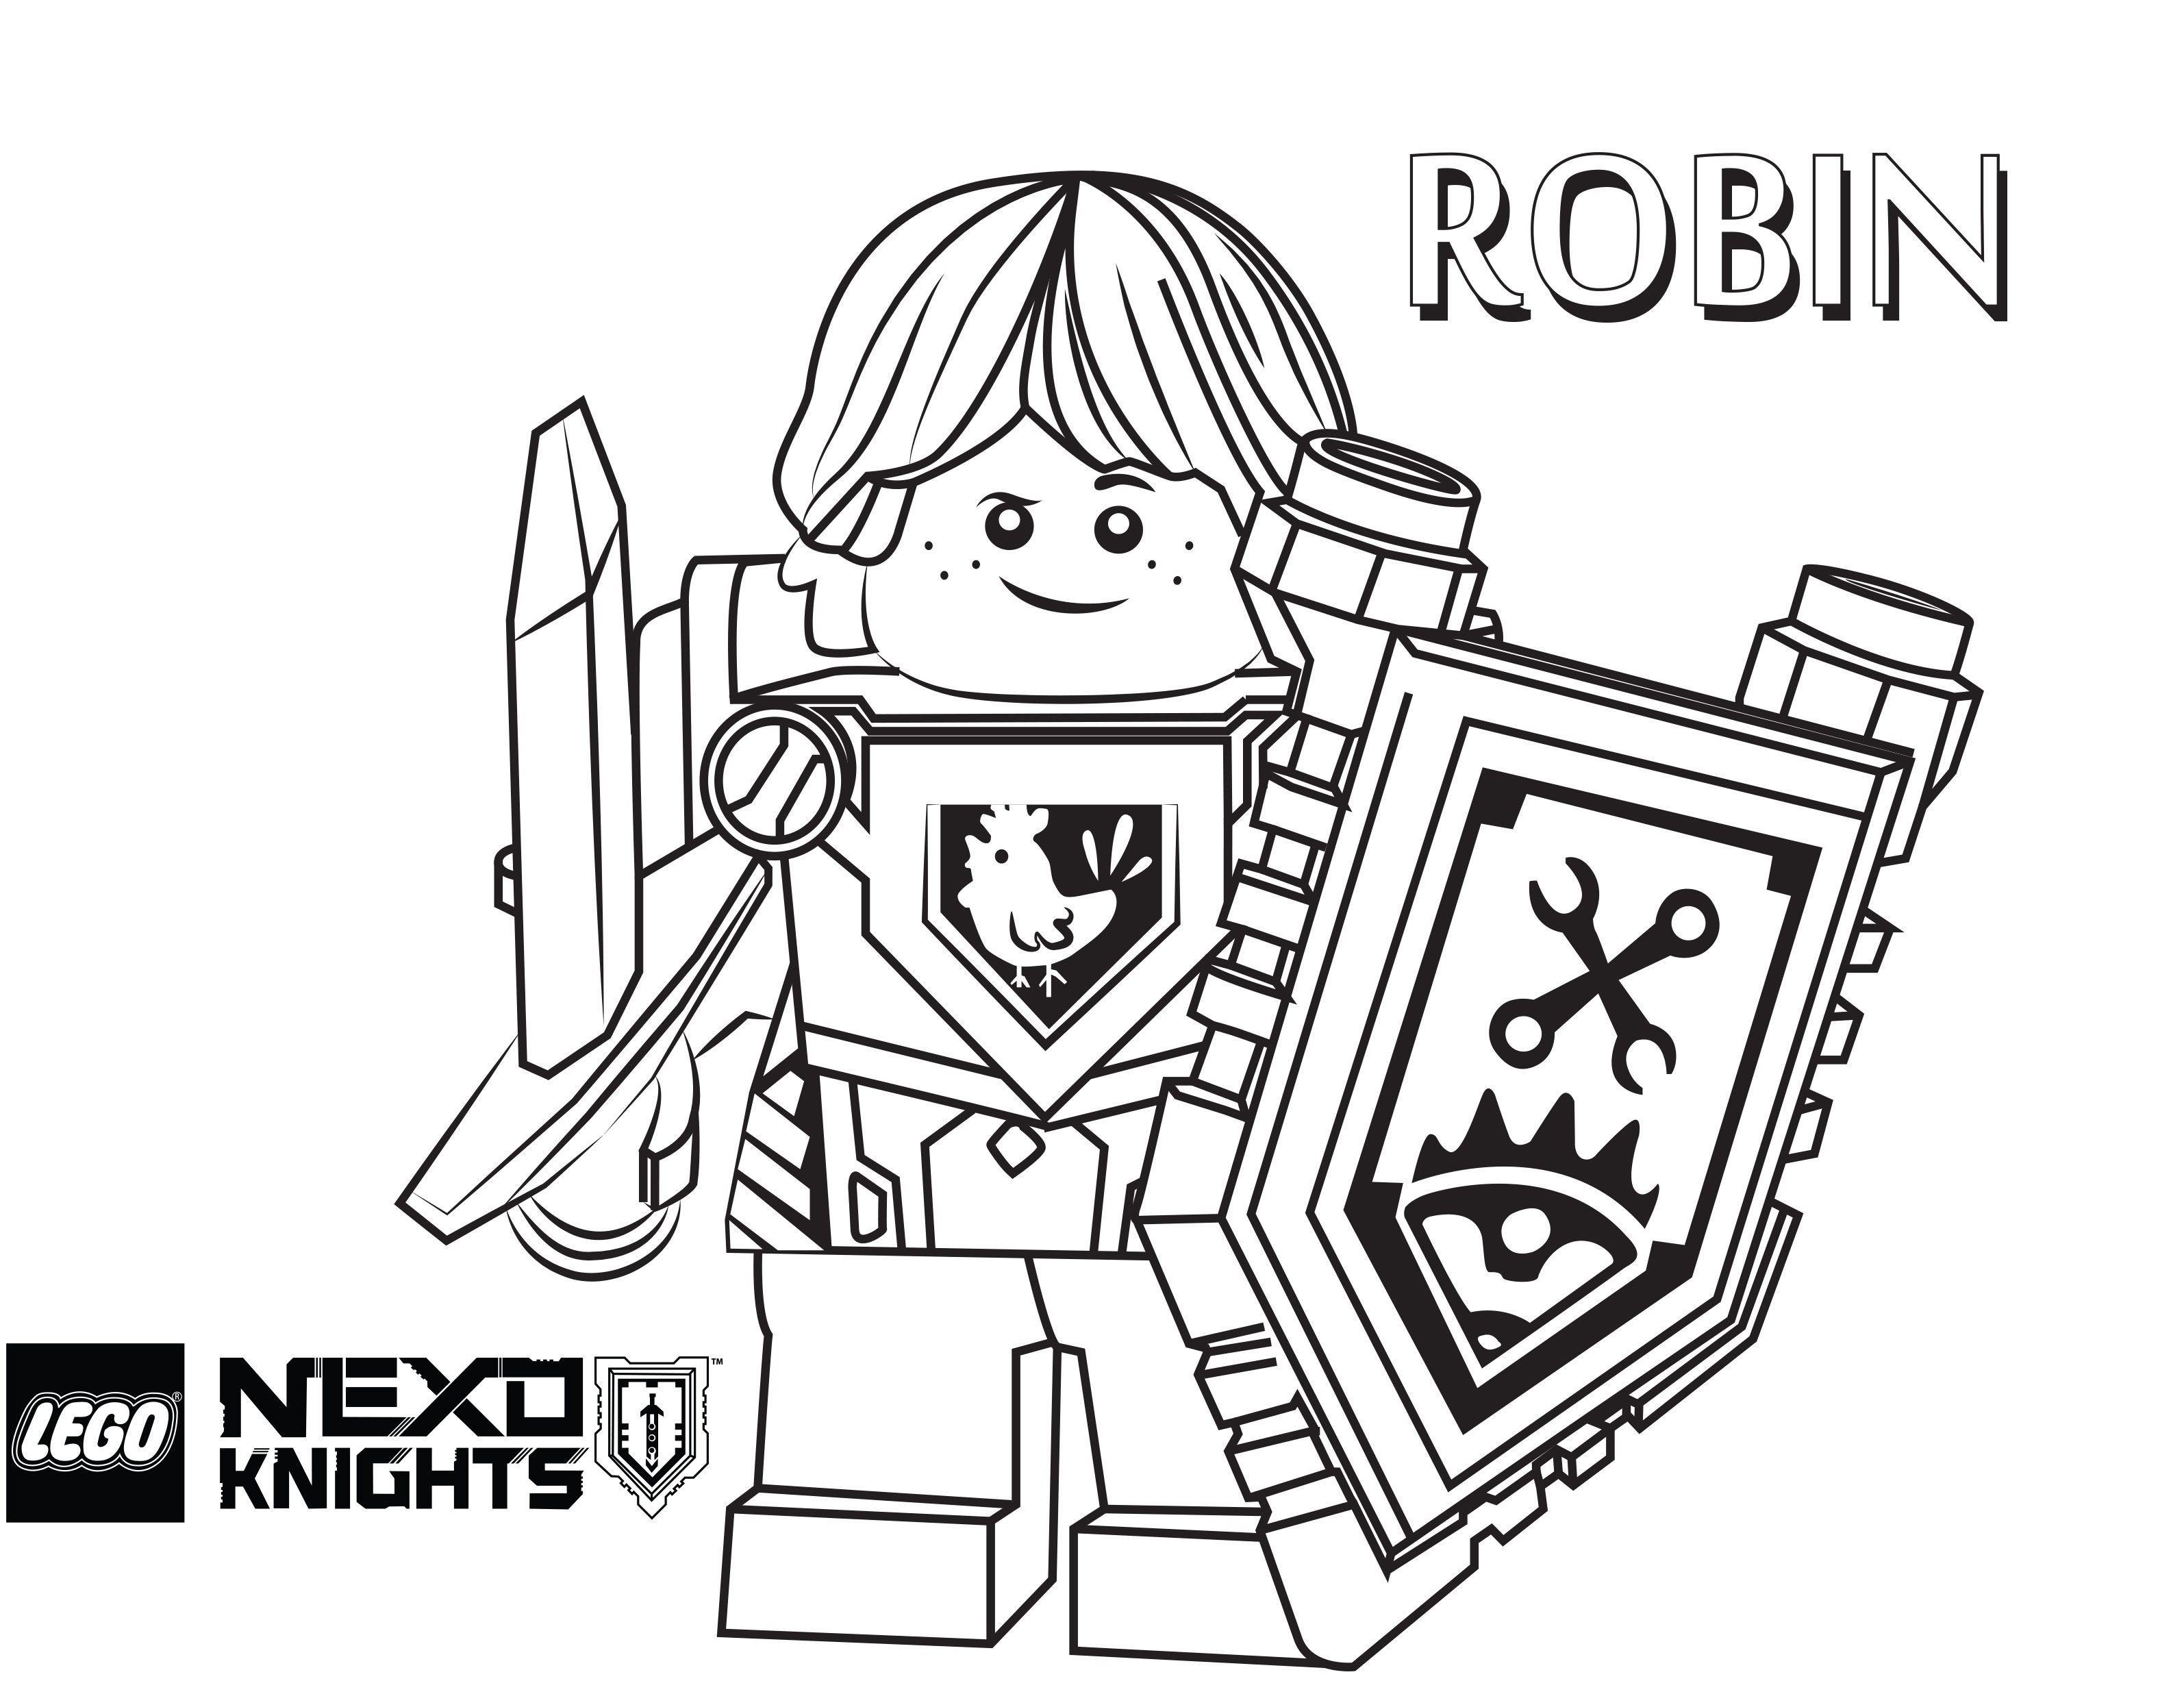 Lego Ausmalbilder Kostenlos Einzigartig Nexo Knights Coloring Pages Fresh 44 Ausmalbilder Kostenlos Nexo Fotos